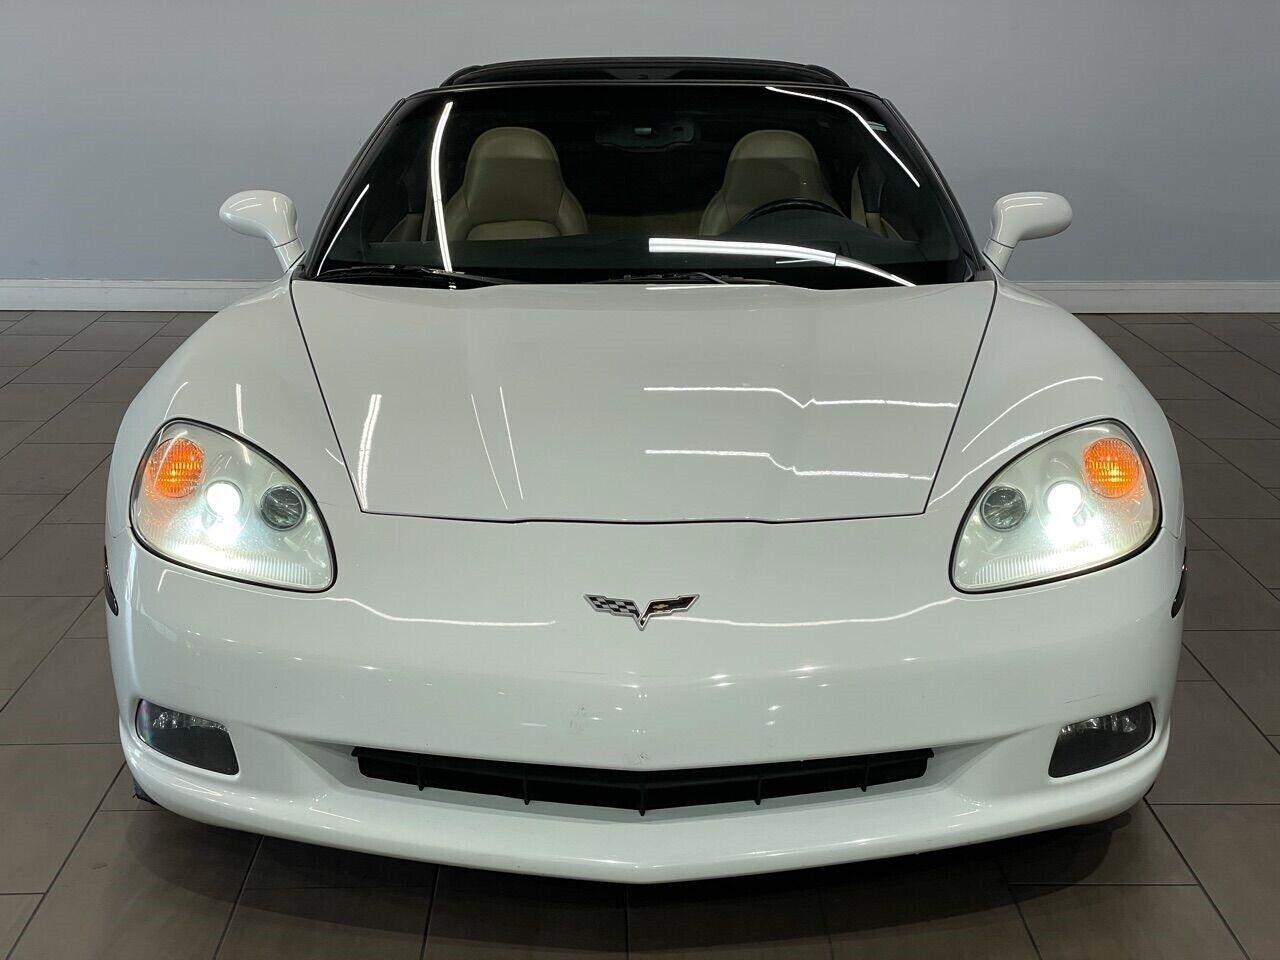 2007 White Chevrolet Corvette Coupe  | C6 Corvette Photo 6